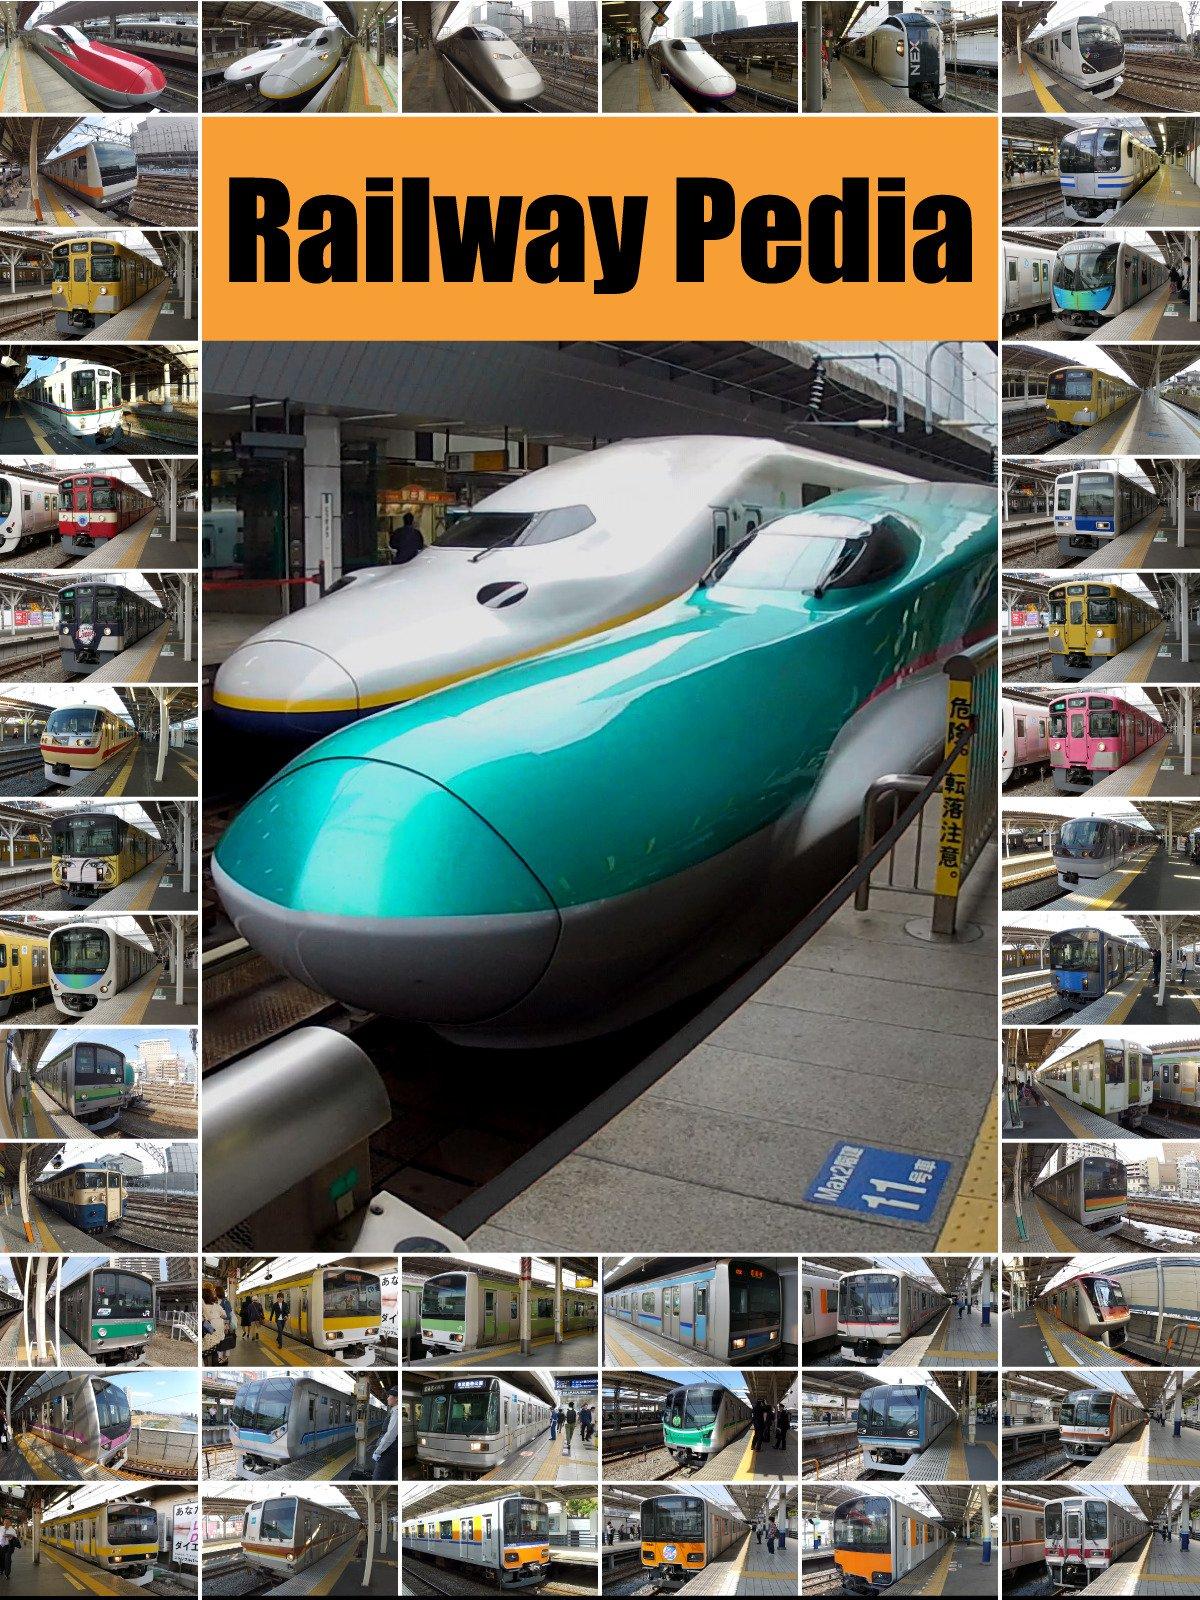 Railway Pedia